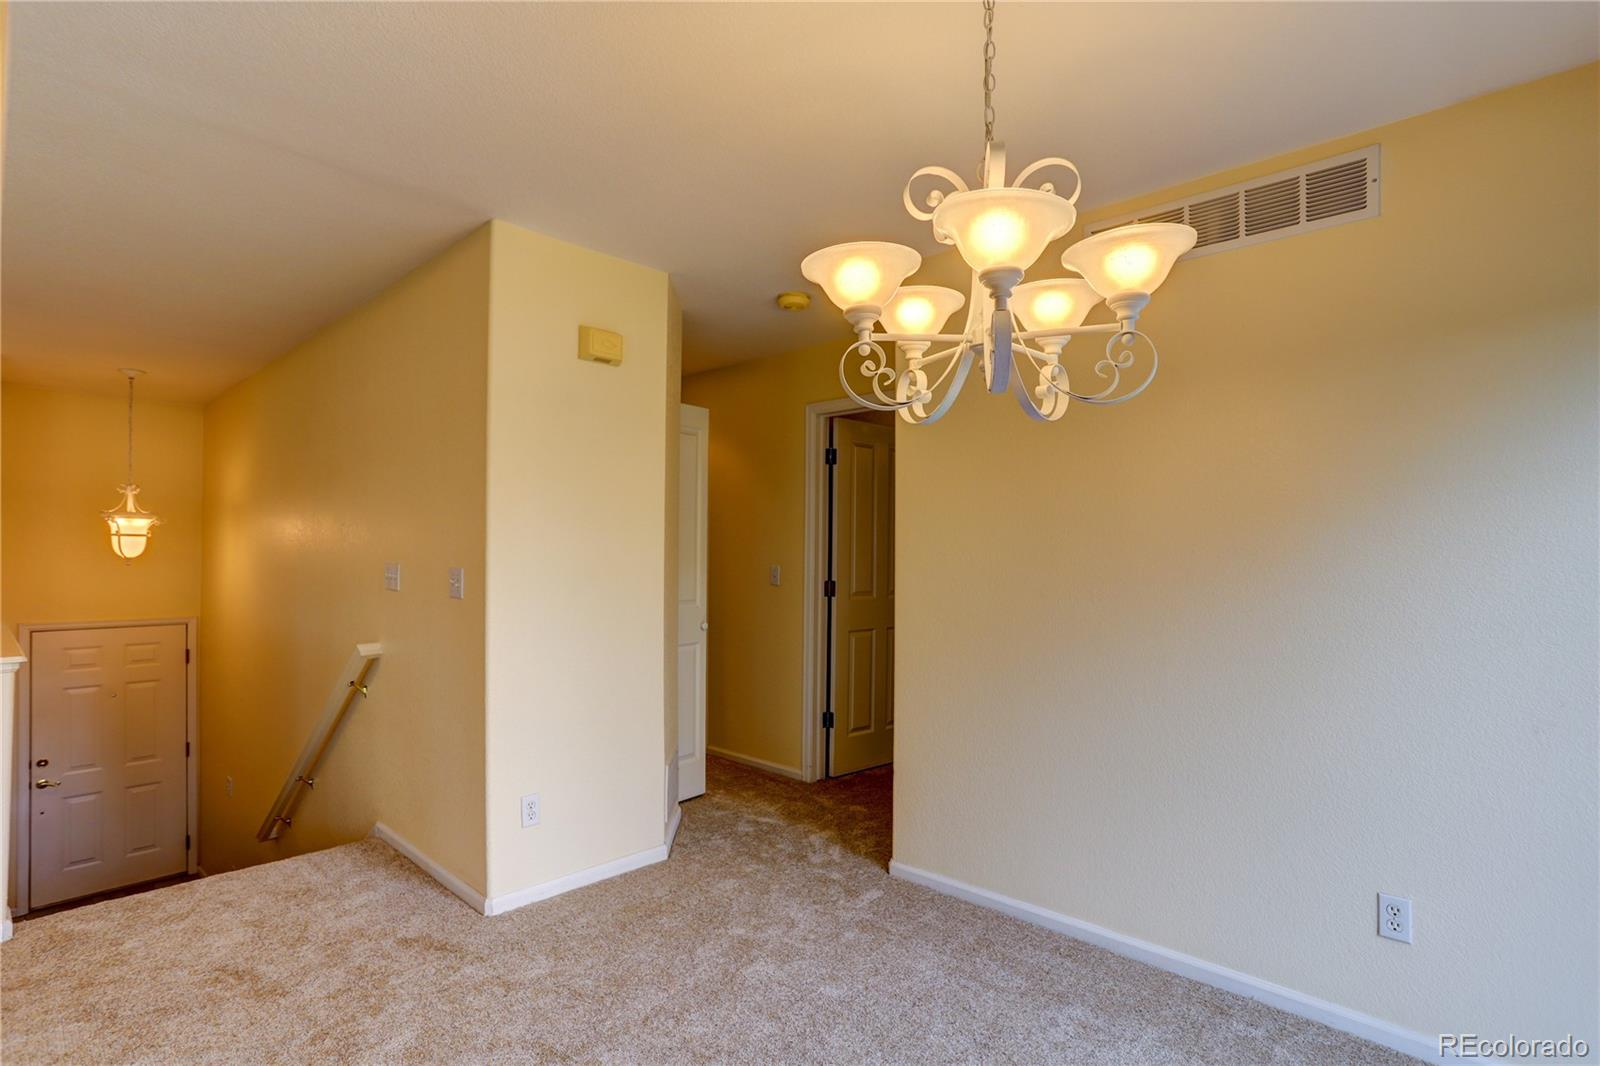 MLS# 2836182 - 6 - 7700 W Grant Ranch Boulevard #10D, Littleton, CO 80123